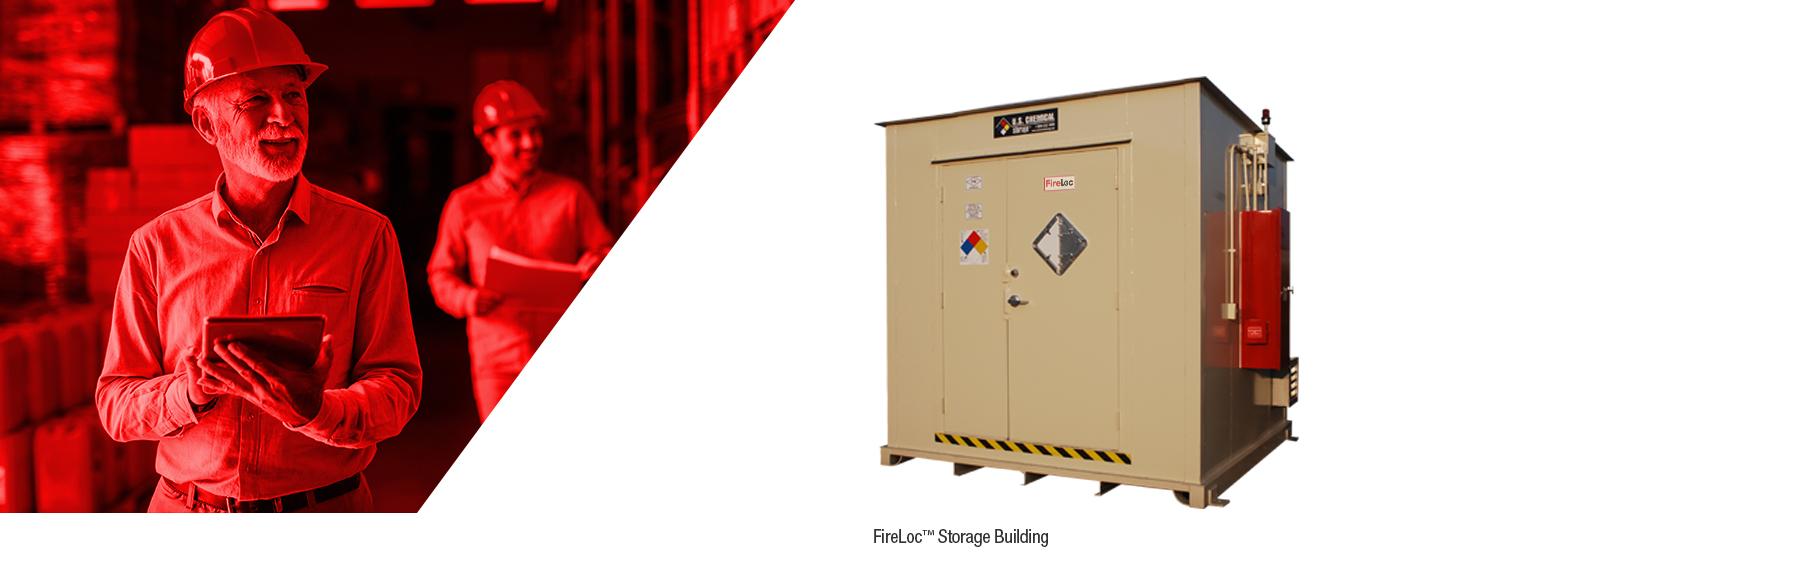 FireLoc flammable liquid storage building from U.S. Chemical Storage.